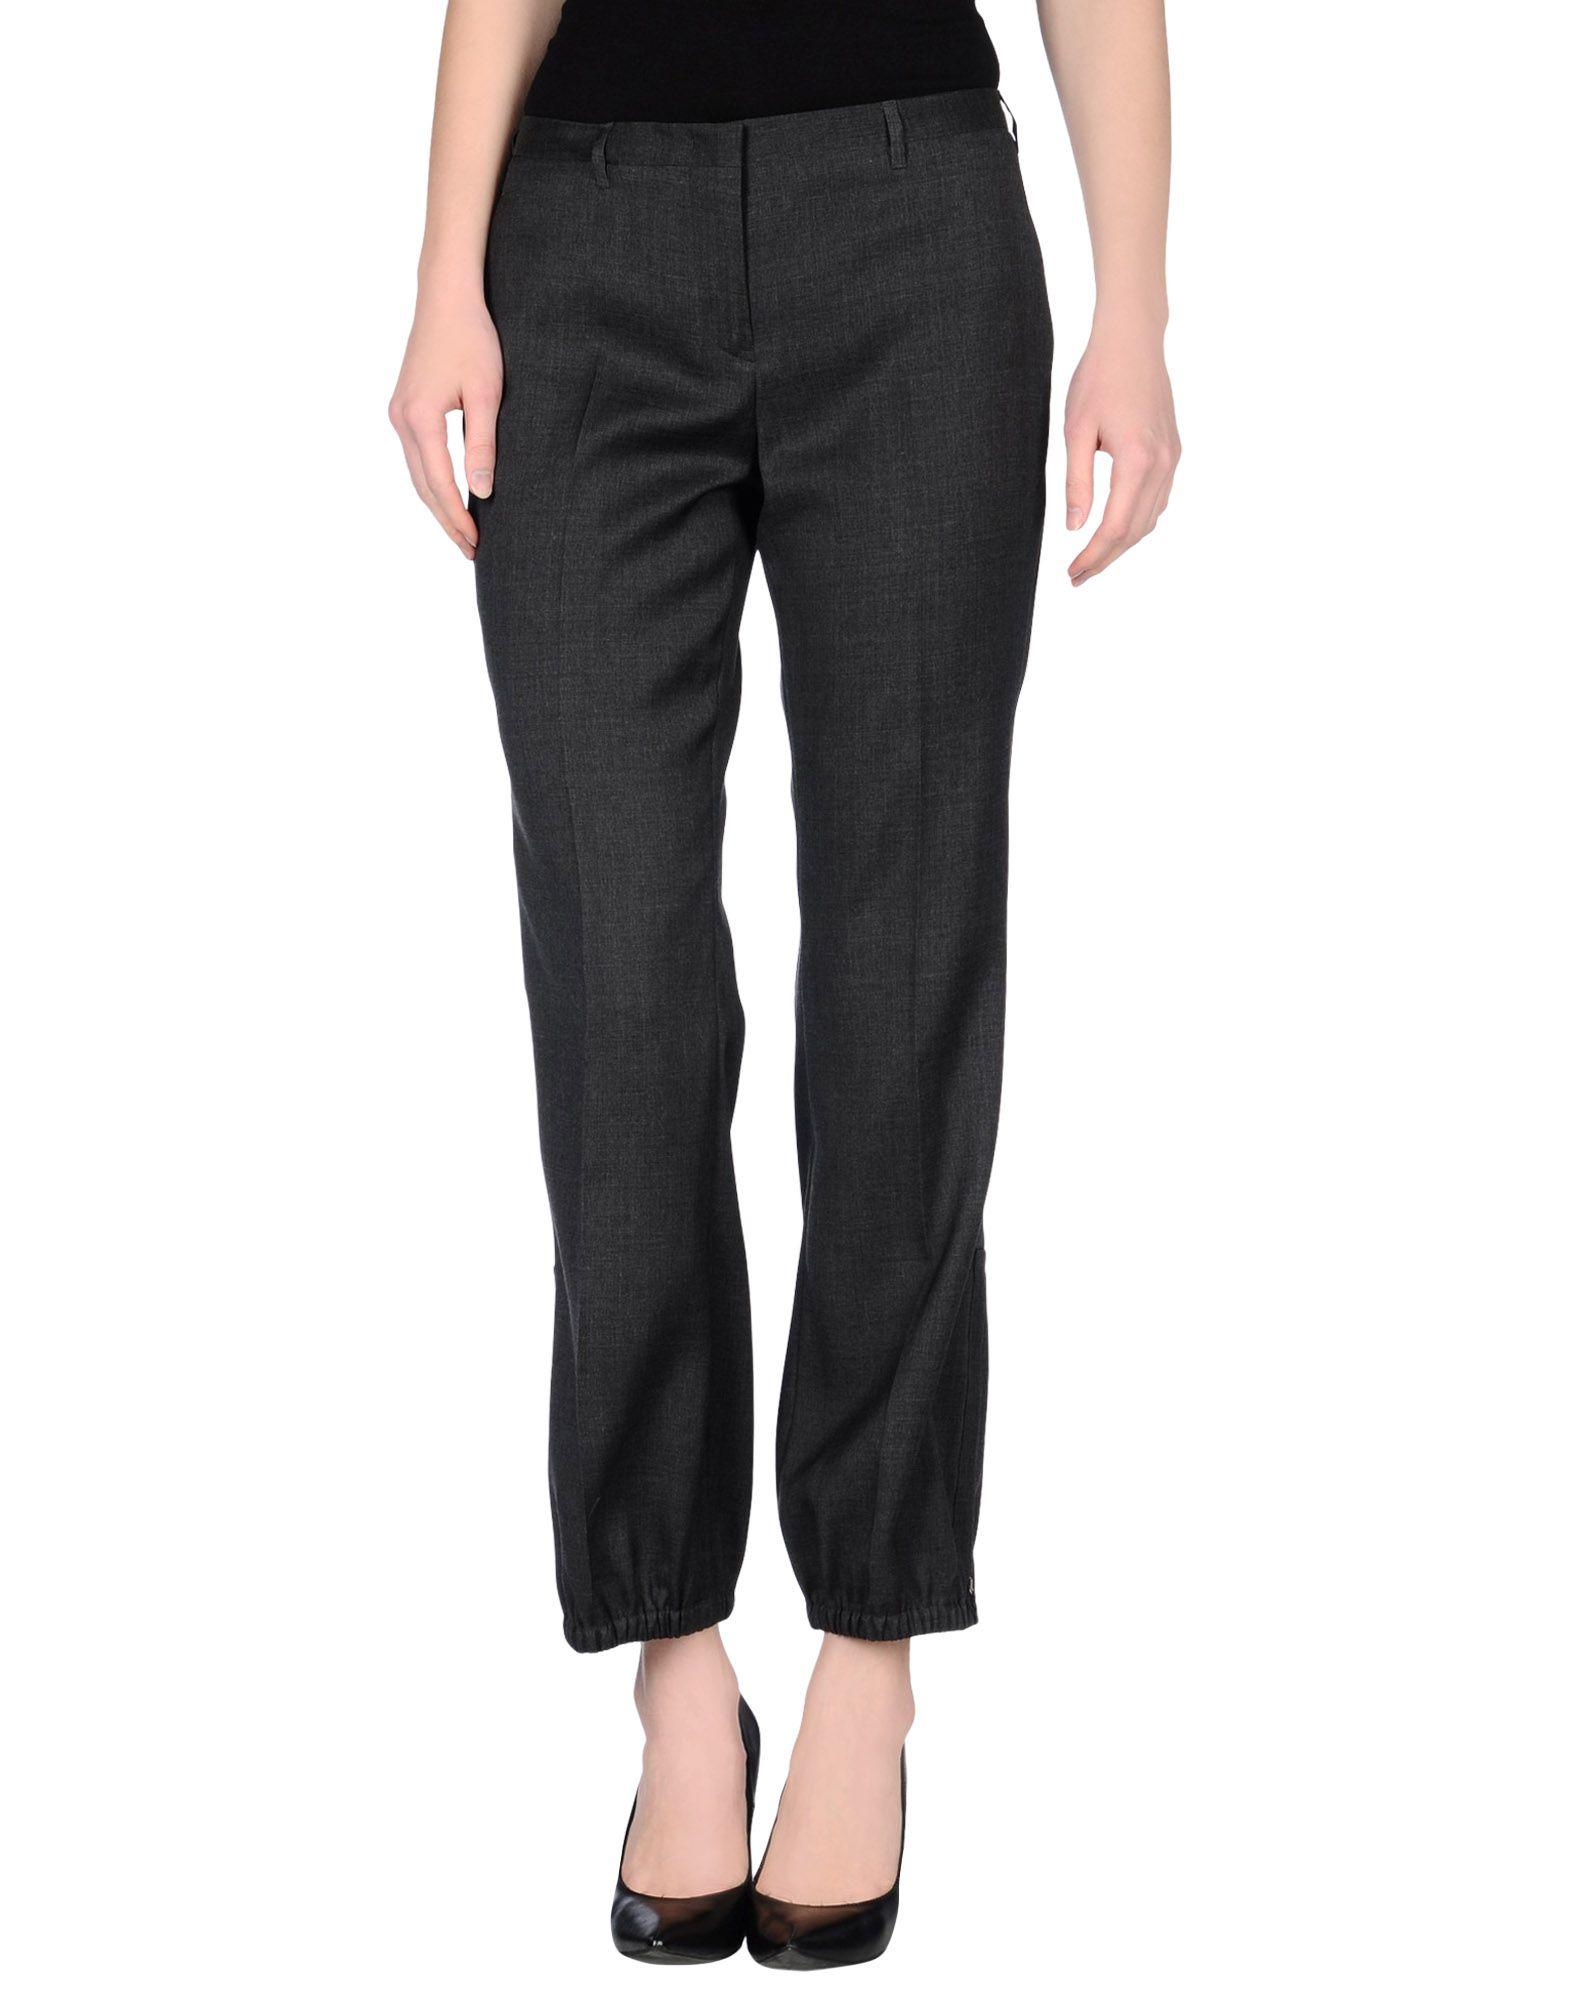 Pantalone Classico Jil Sander Donna - Acquista online su MJ1r4hclX